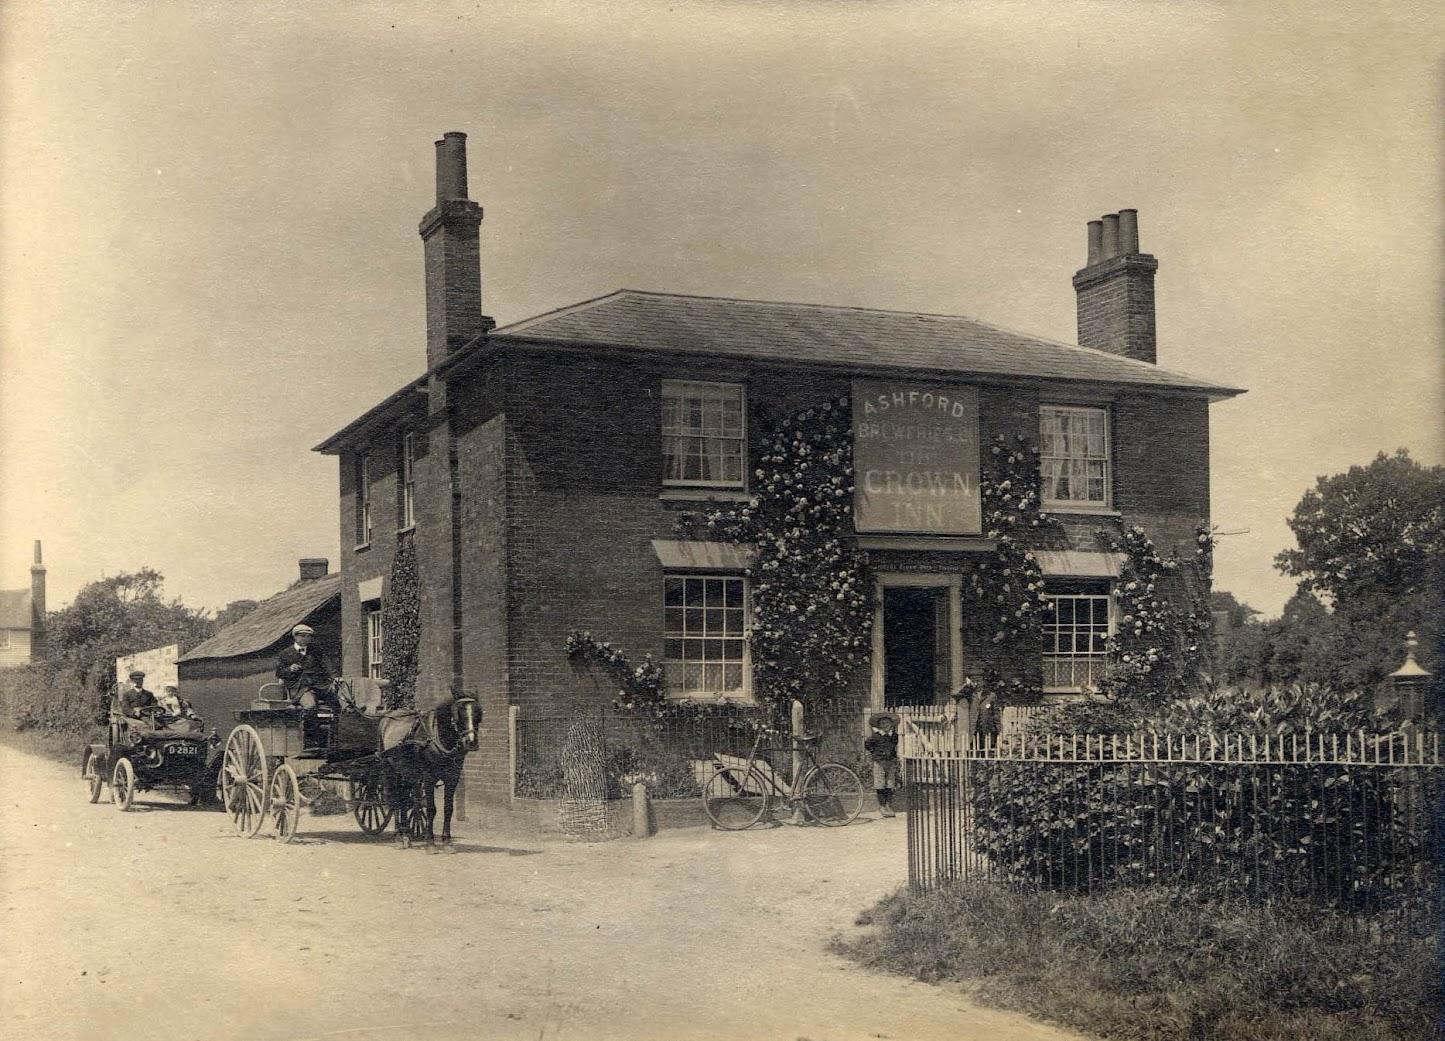 The Crown Inn, St Michaels, 1905